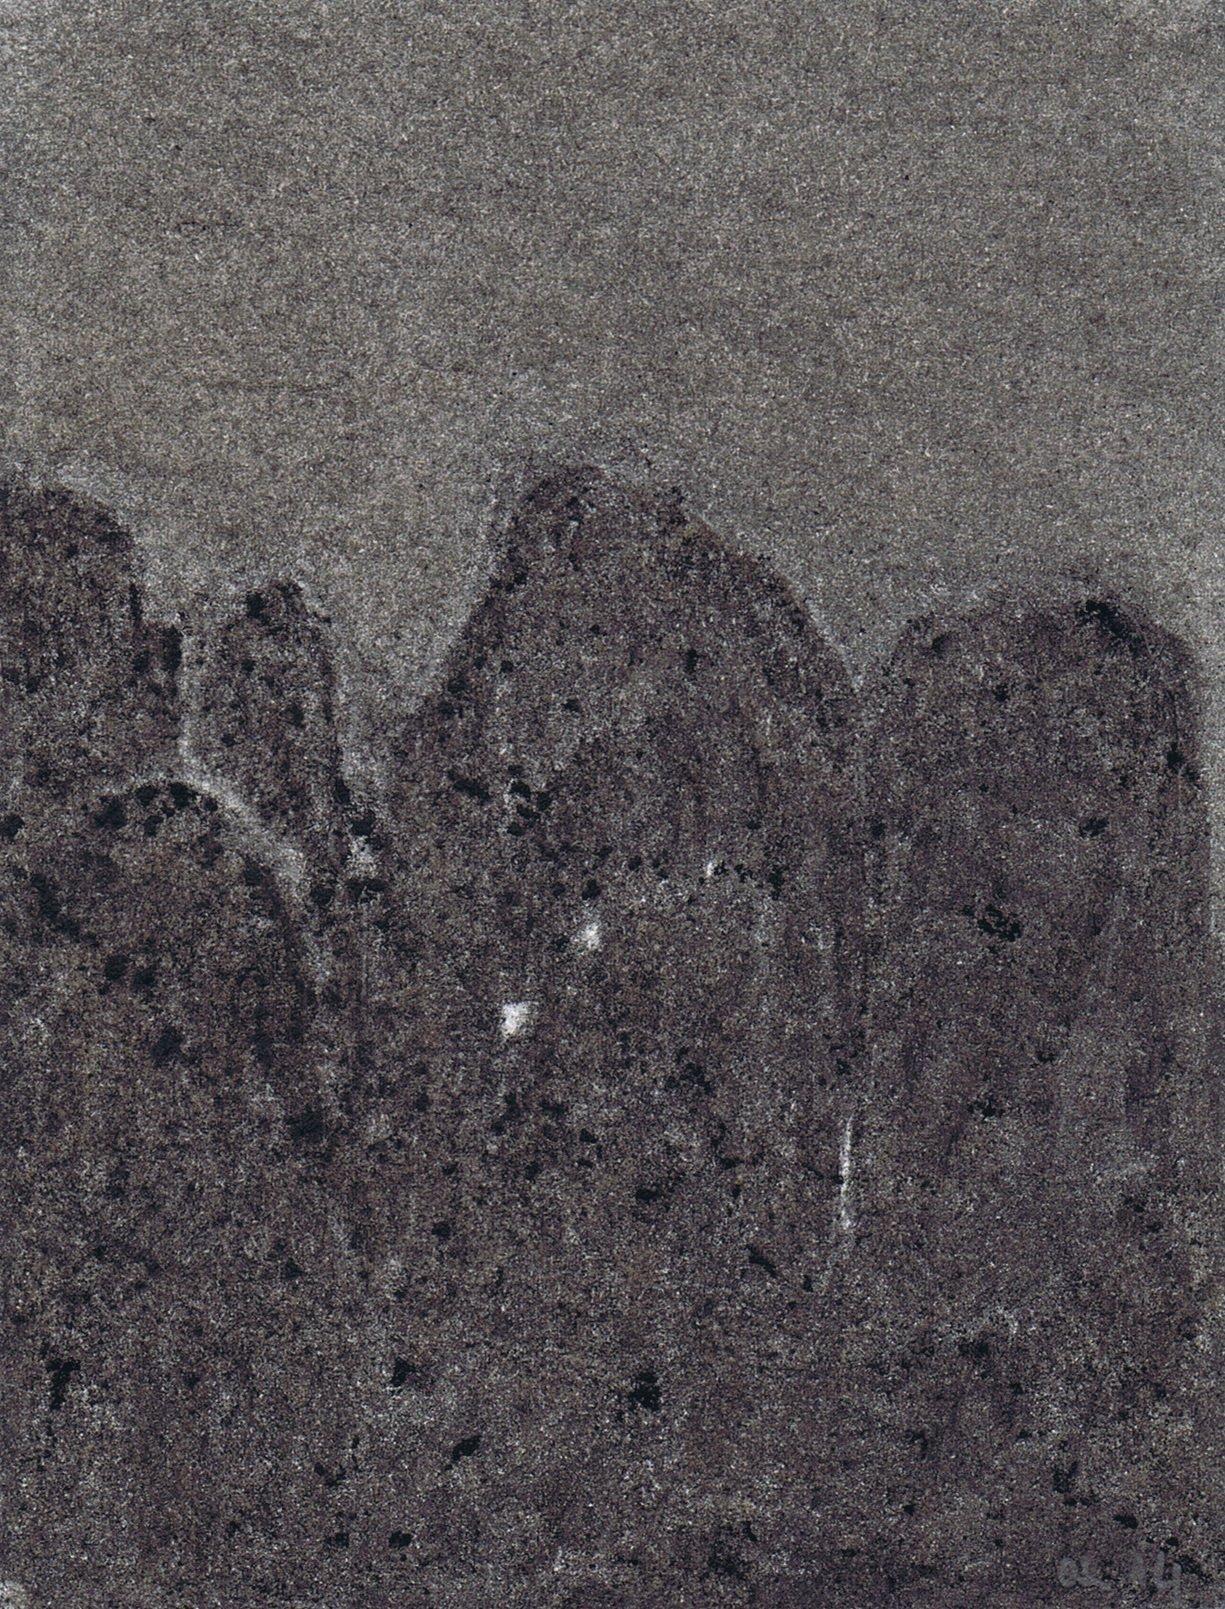 Mégalithe au clair de lune VI